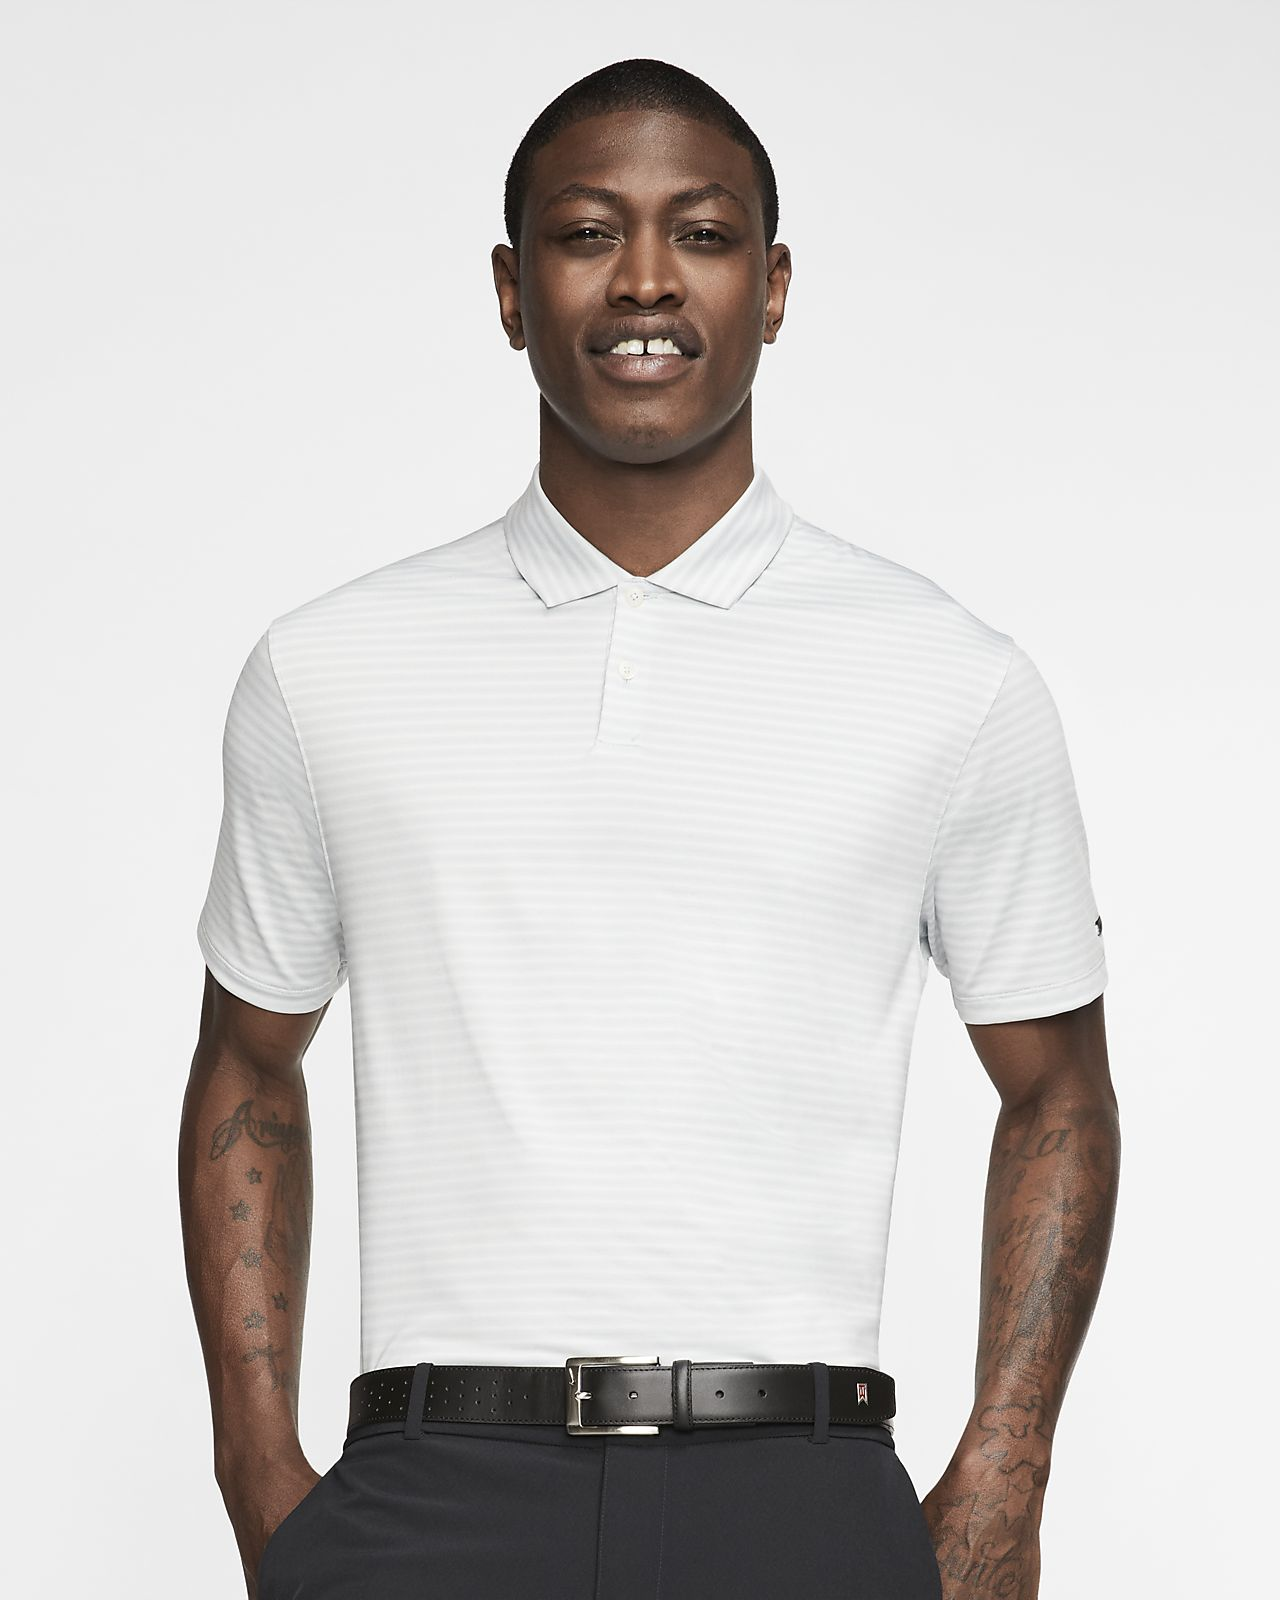 Nike Dri-FIT Tiger Woods Vapor 男子条纹高尔夫翻领T恤